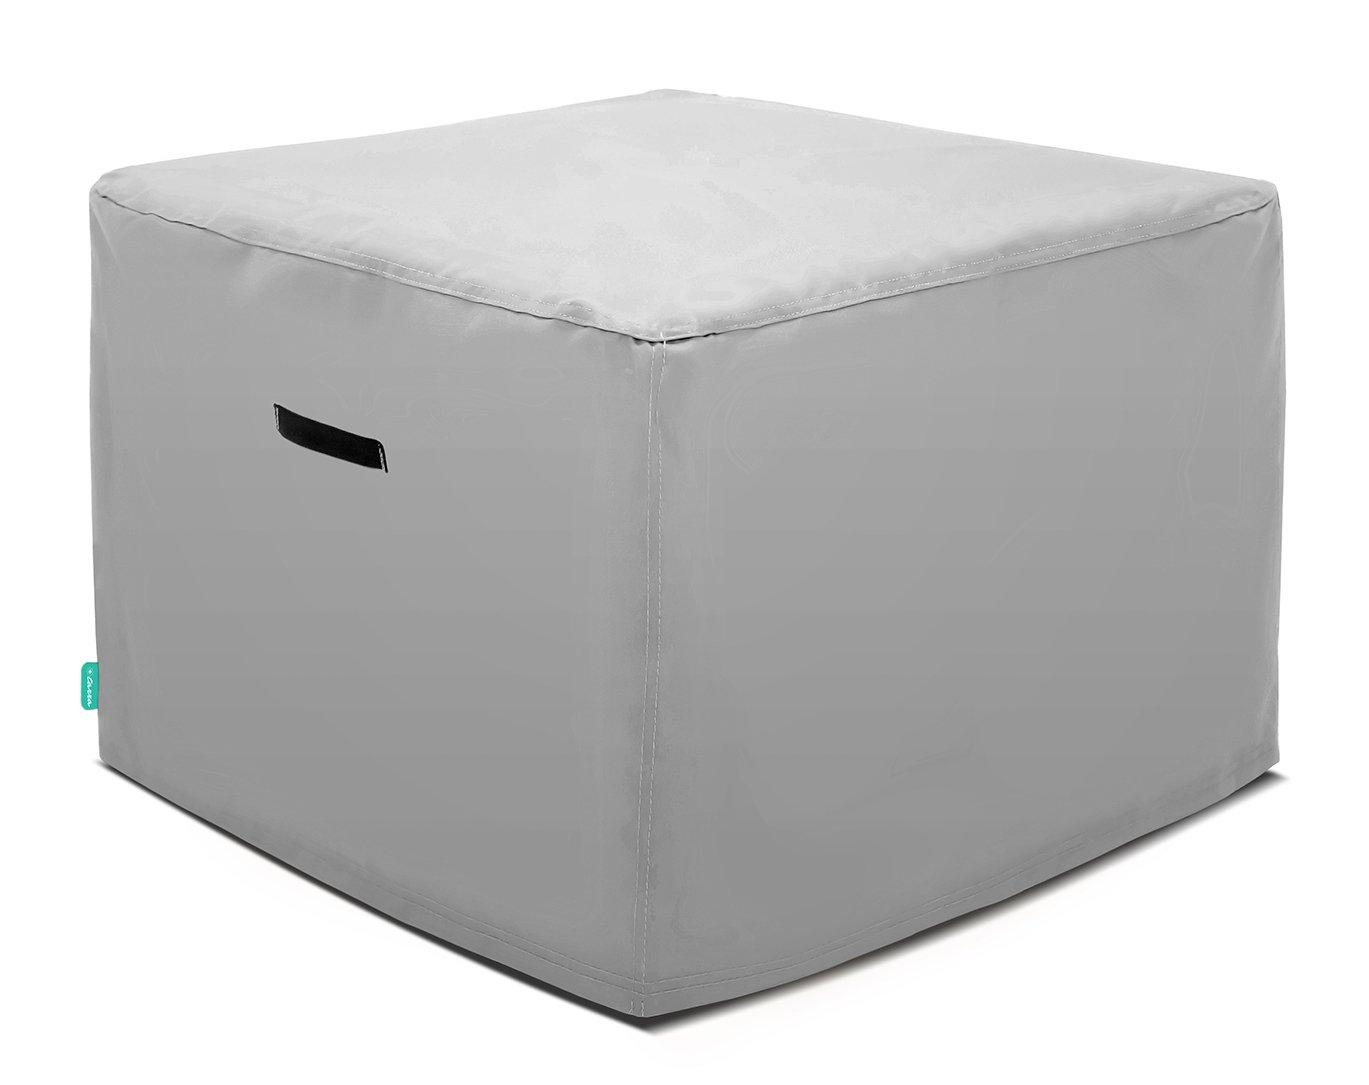 Tarra Home Universal Outdoor Patio Square Table Cover, 38'' W x 38'' D x 30'' H, Presidium Gray